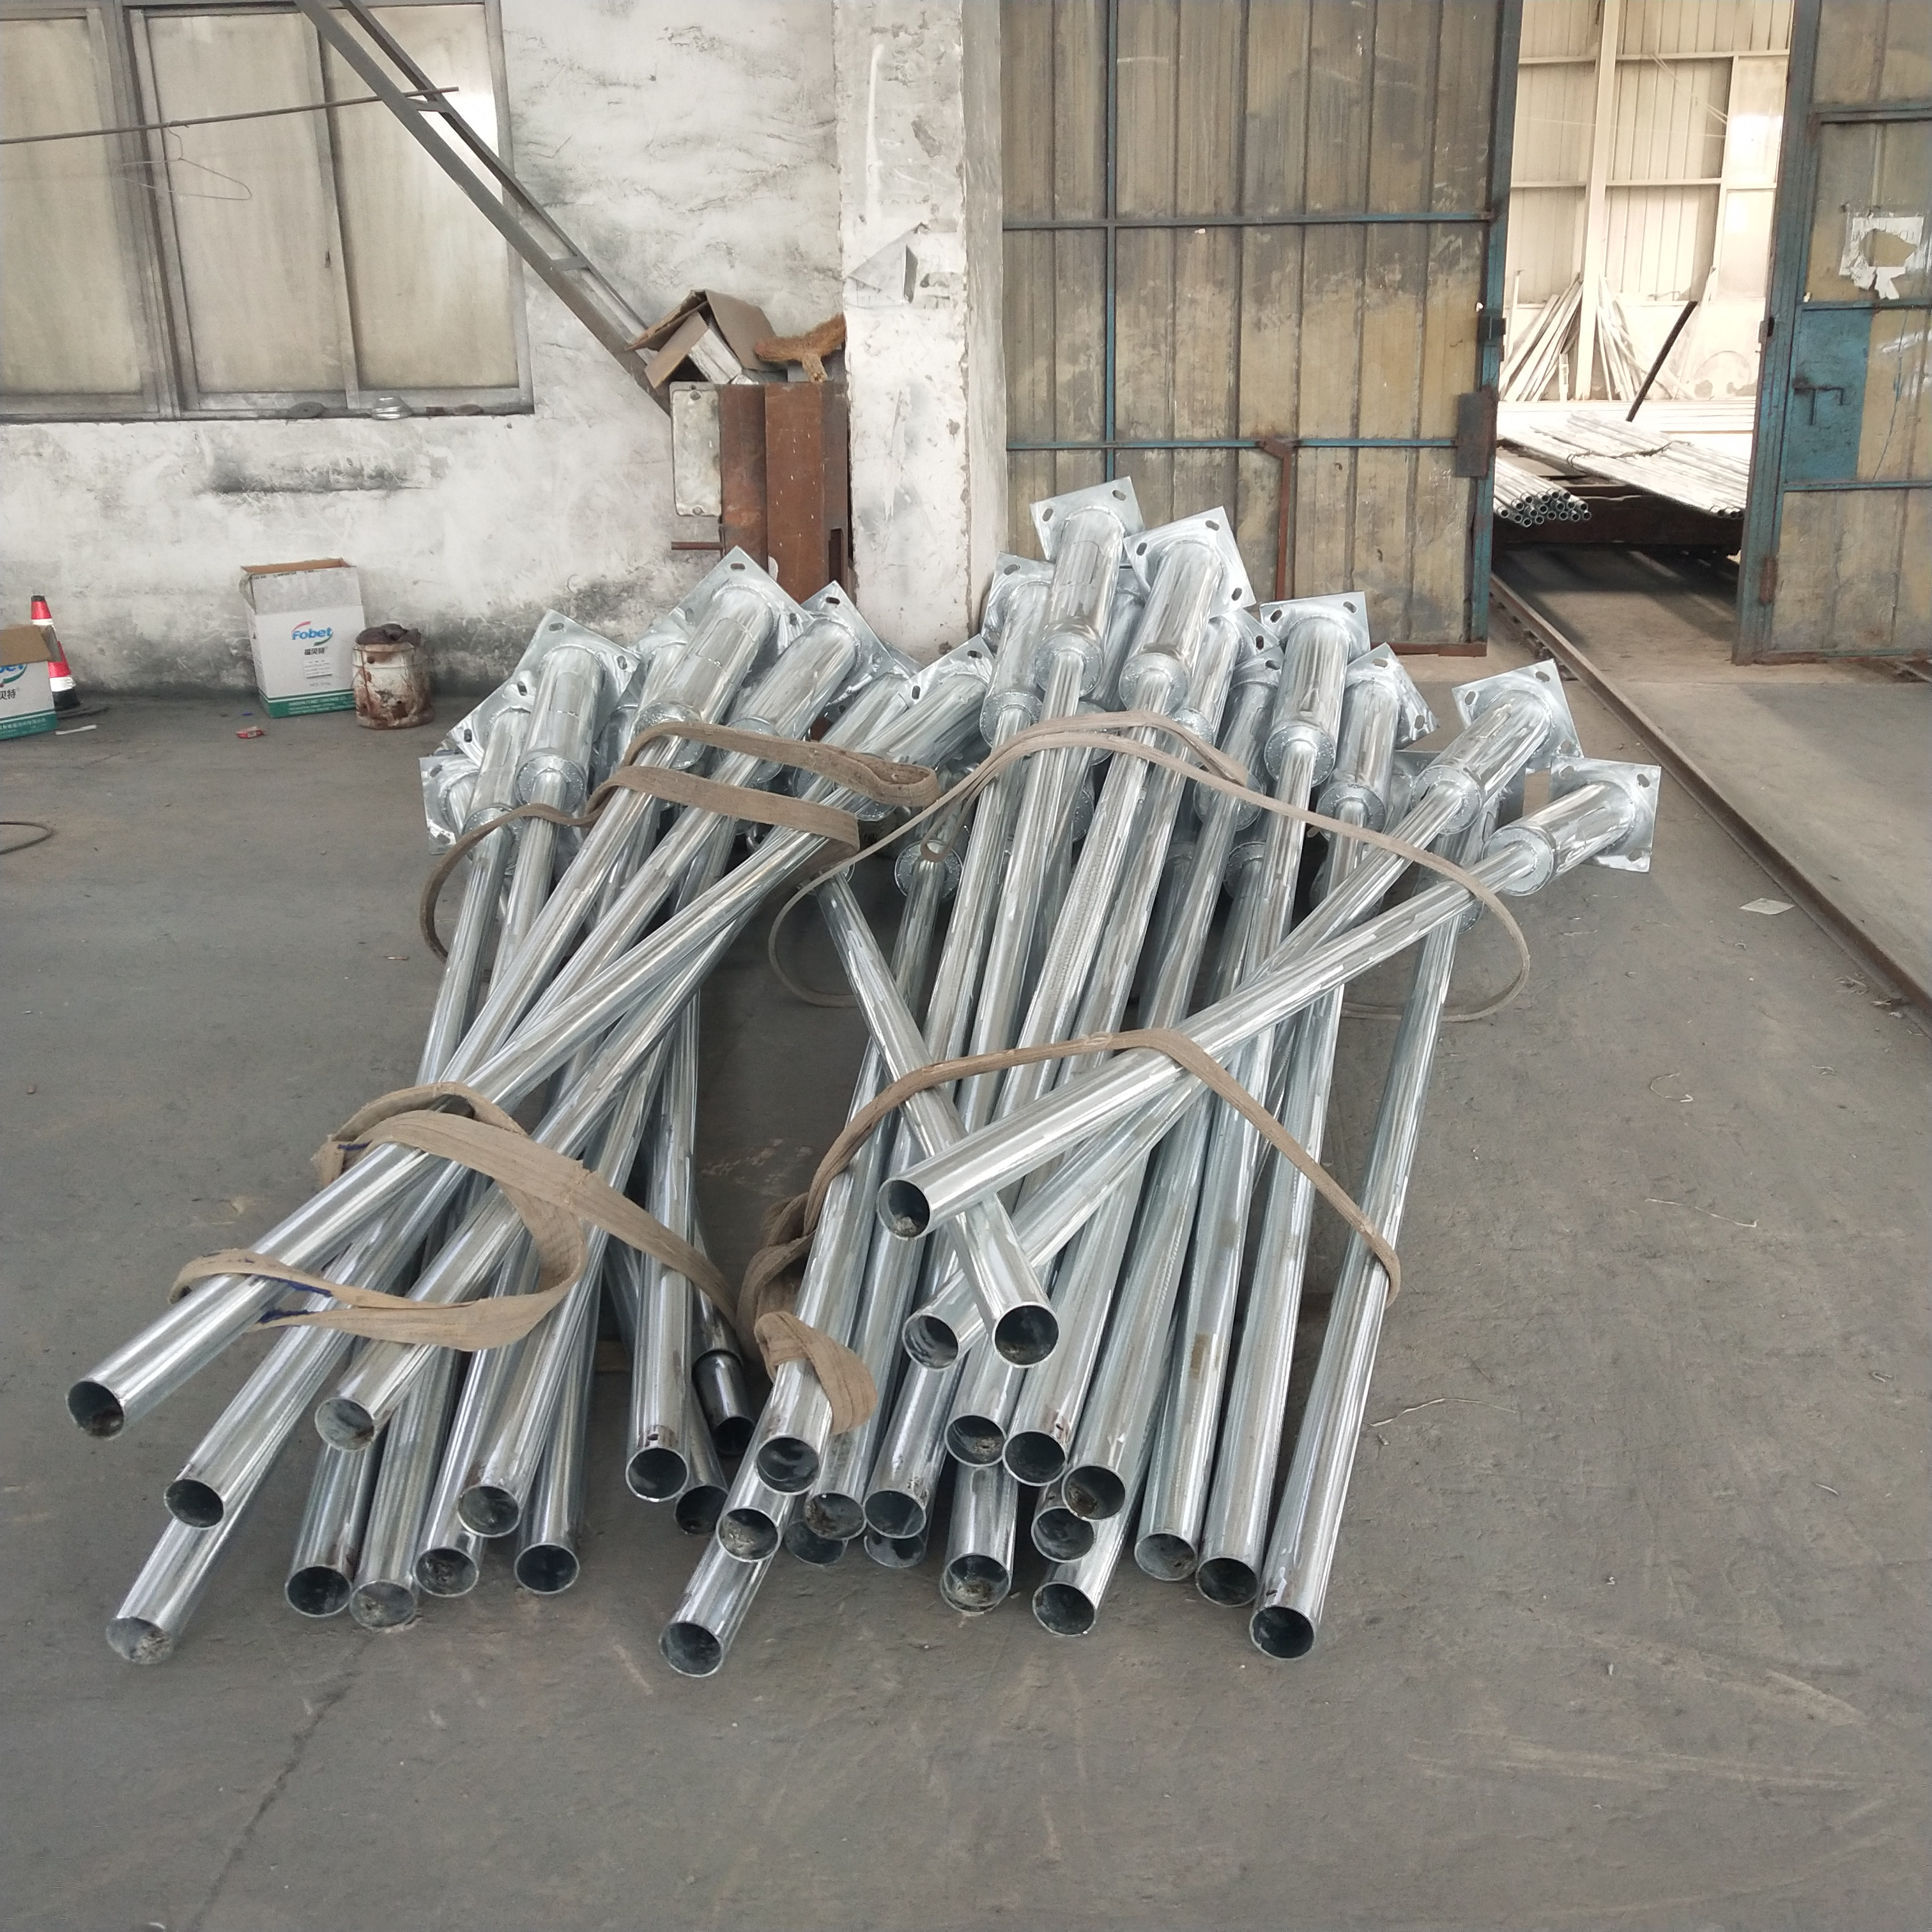 Galvanized single-arm decorative street lighting steel pole